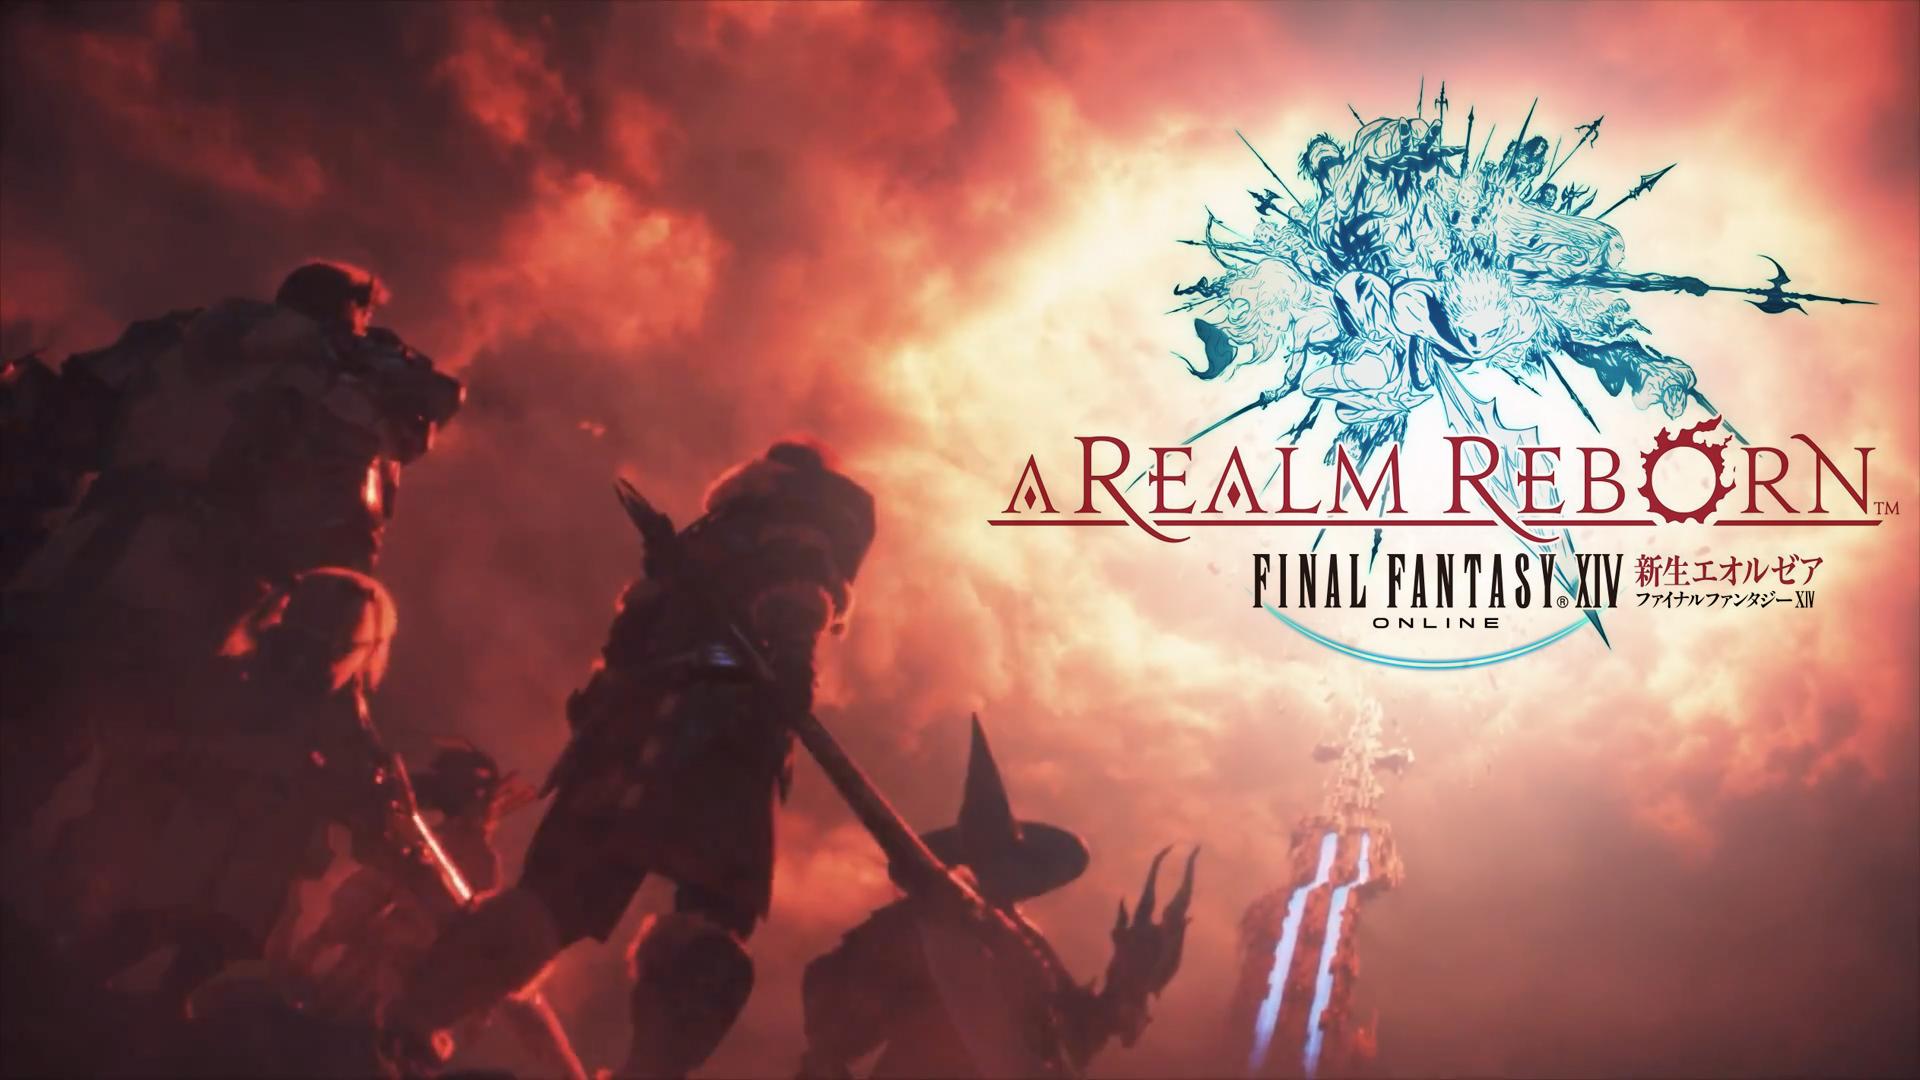 Final Fantasy XIV ARR Wallpaper by AlboQuest